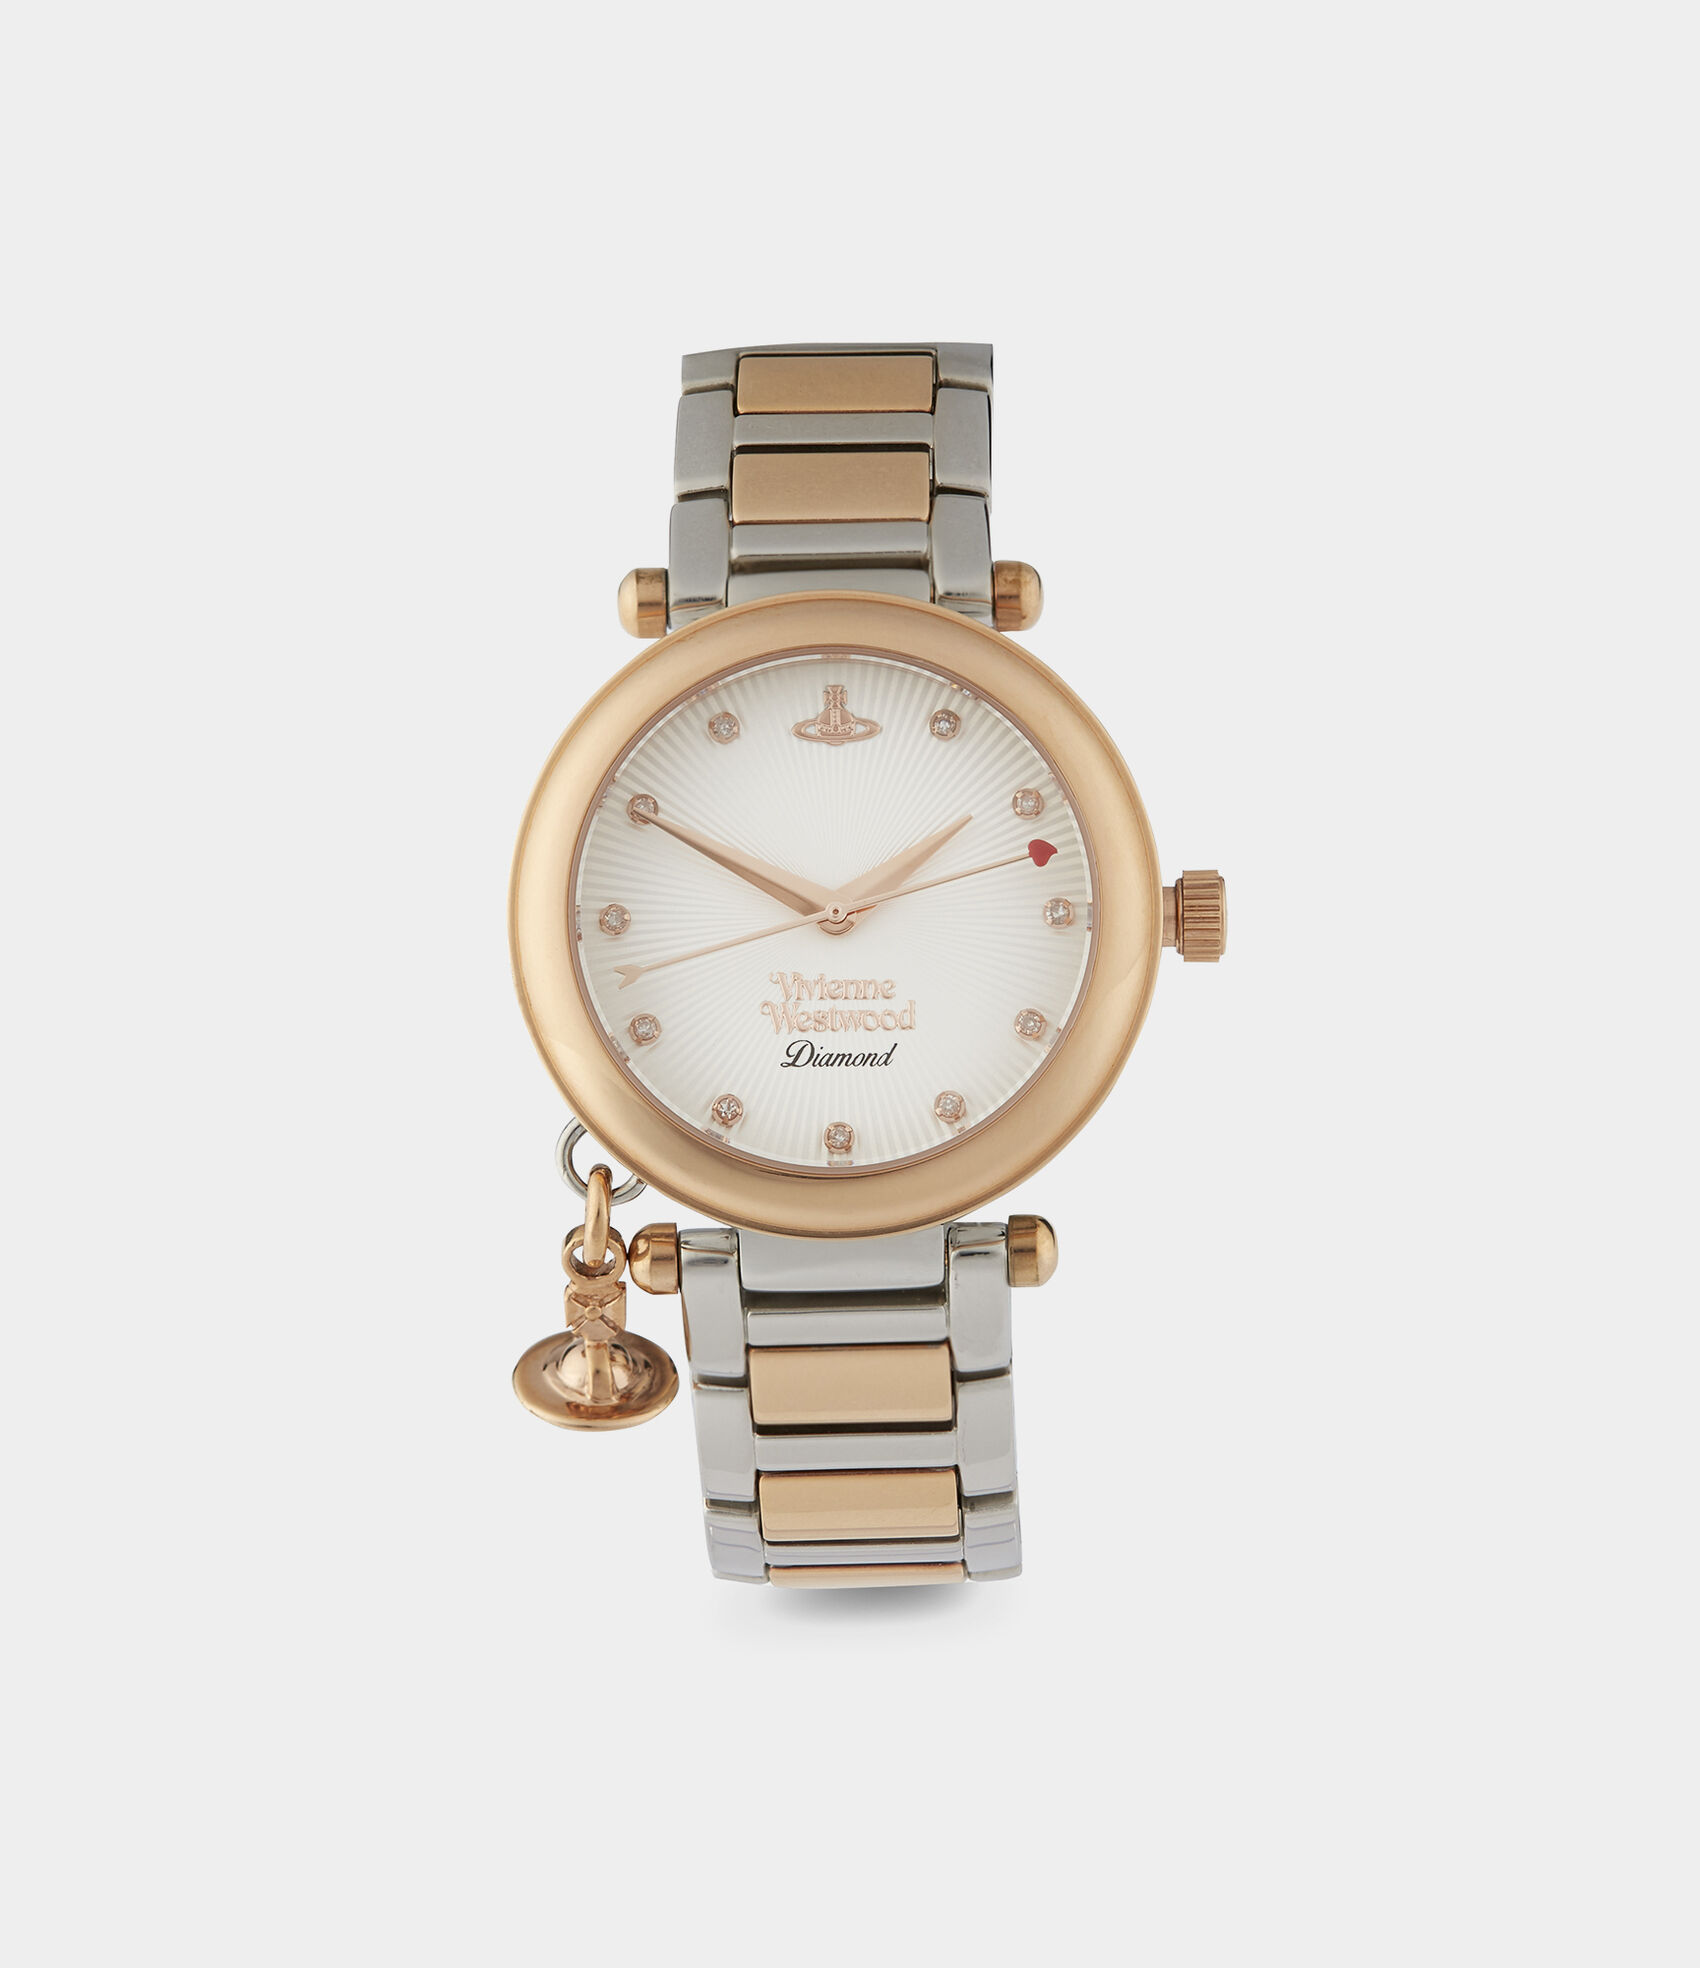 b1a177e2a22 Vivienne Westwood Women's designer Watches   Women's jewellery ...